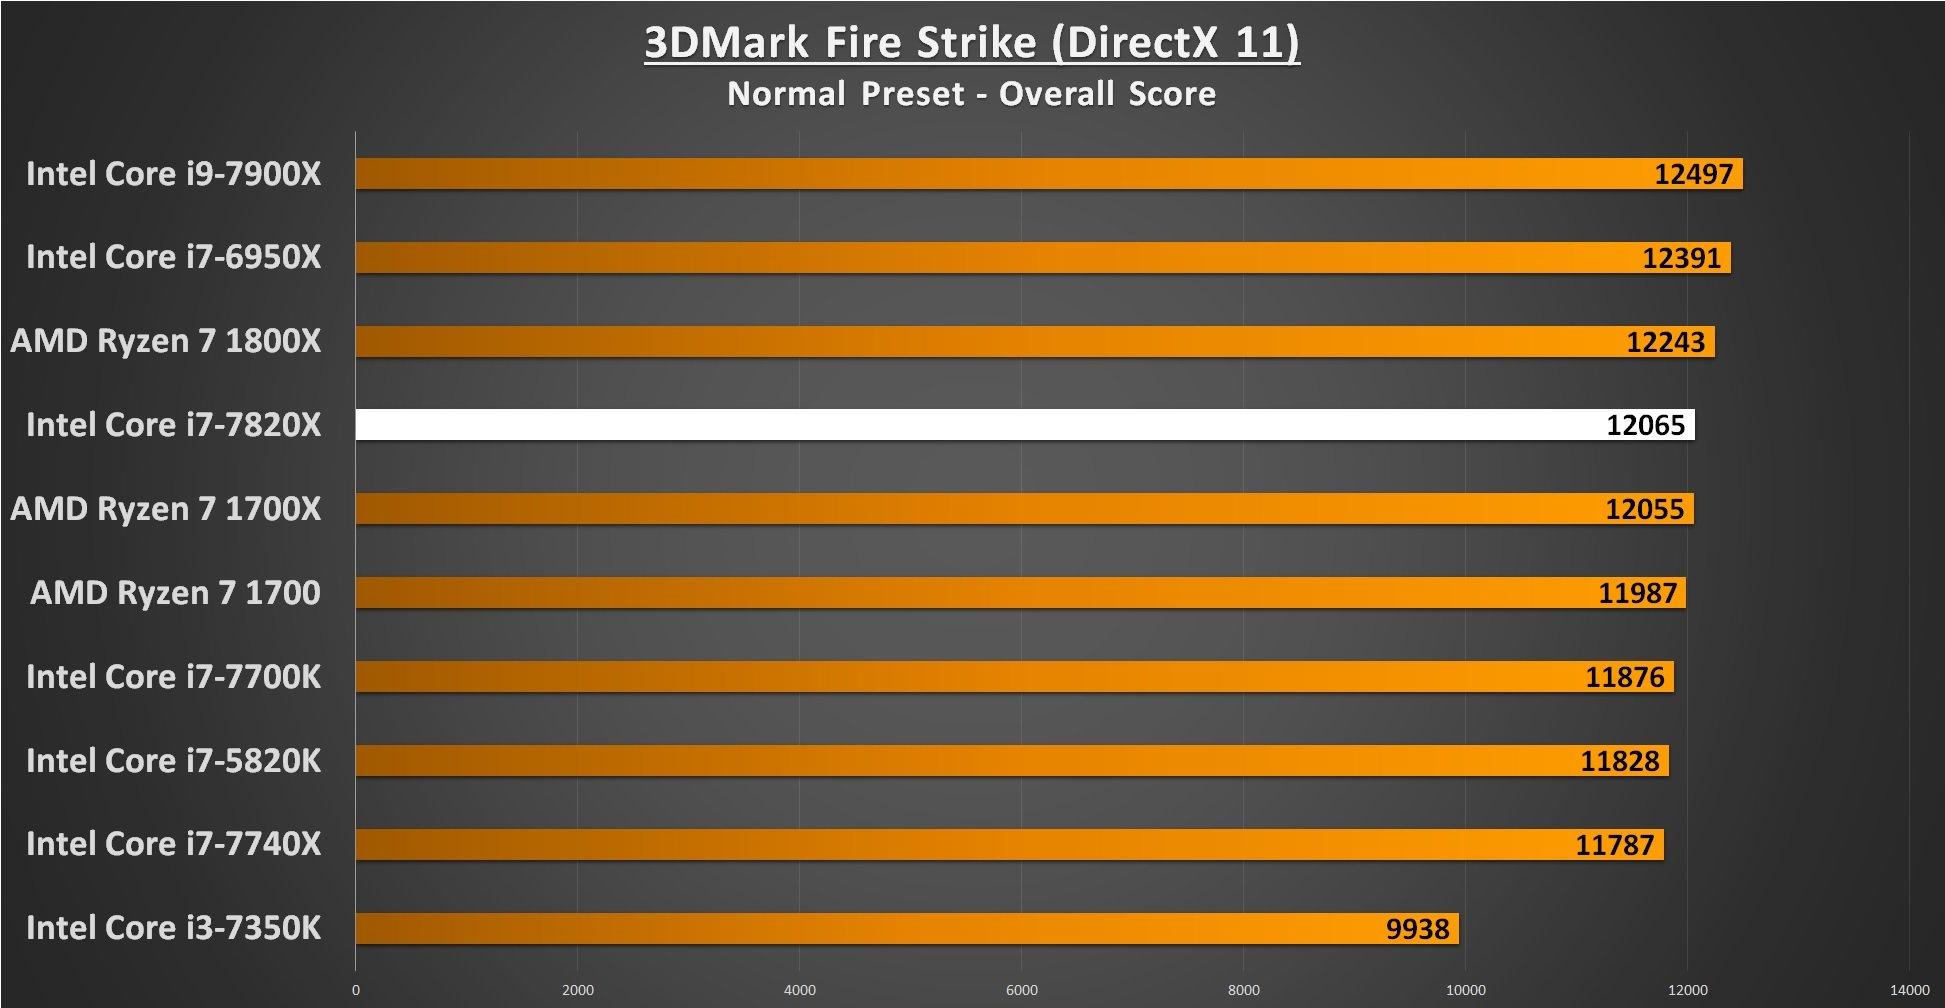 3DMark Fire Strike - i7-7820X Performance